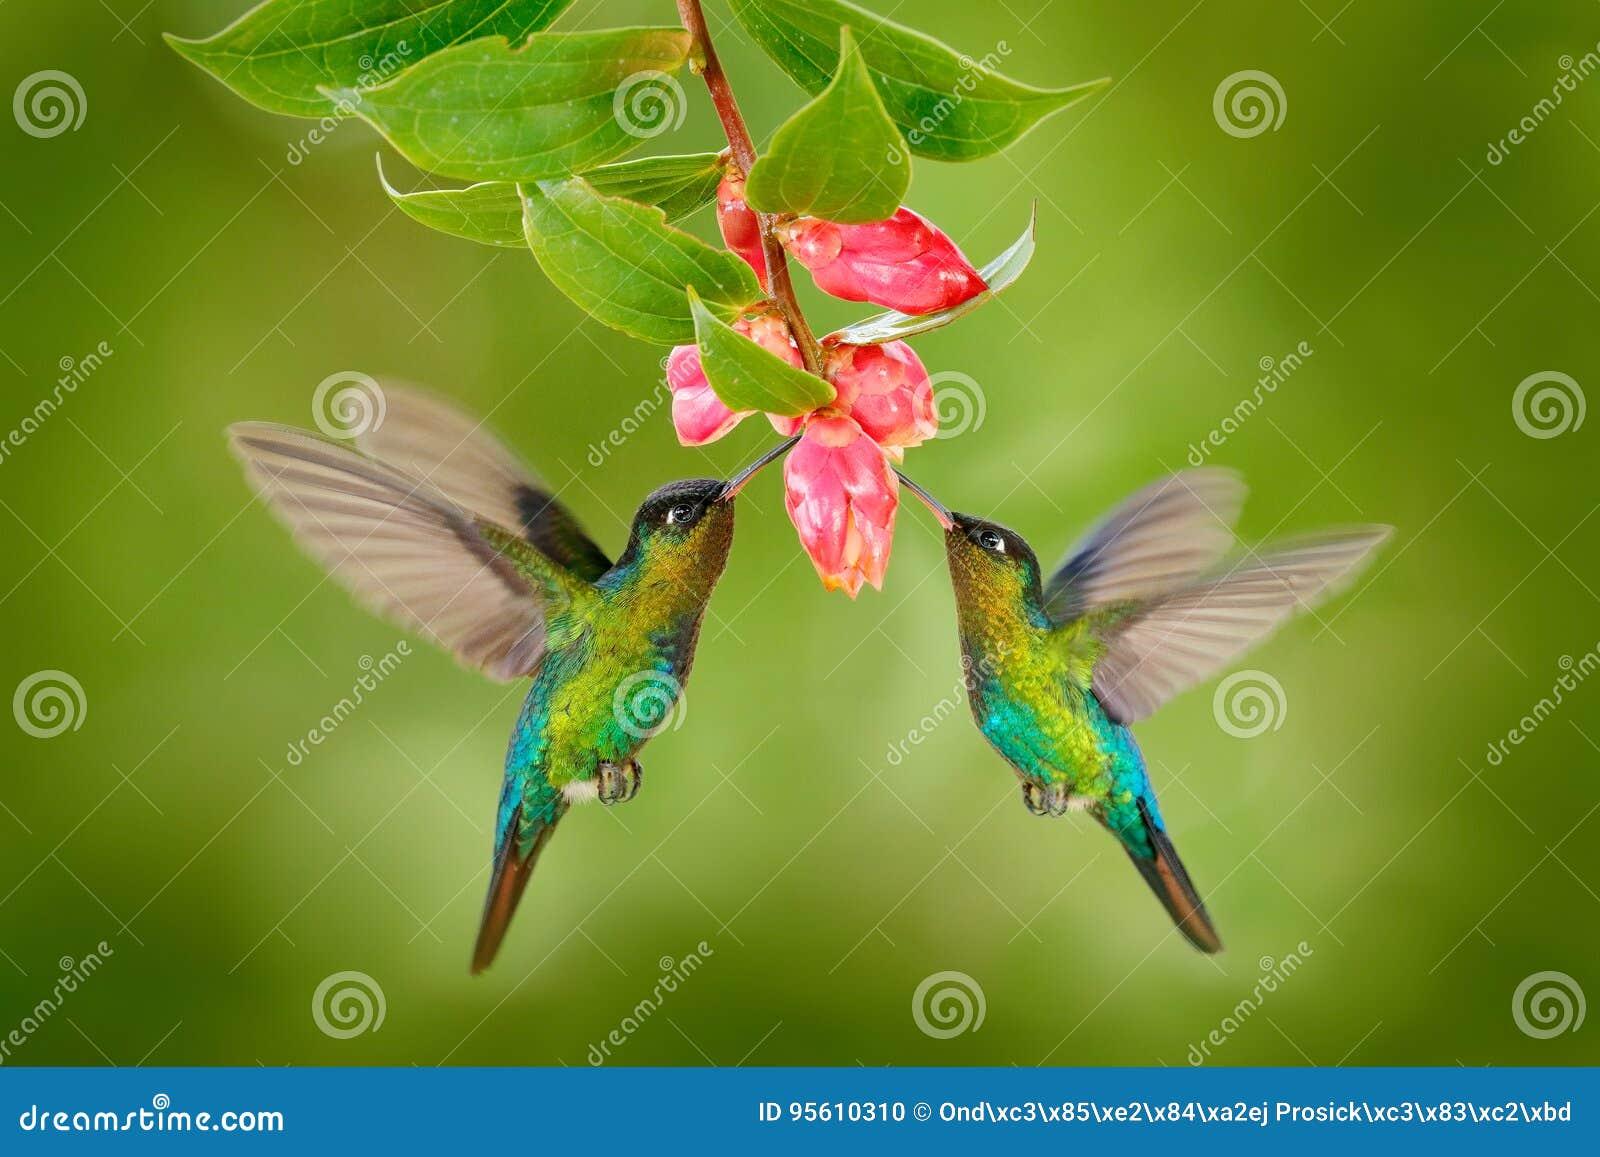 Two hummingbird bird with pink flower. hummingbirds Fiery-throated Hummingbird, flying next to beautiful bloom flower, Savegre, Co